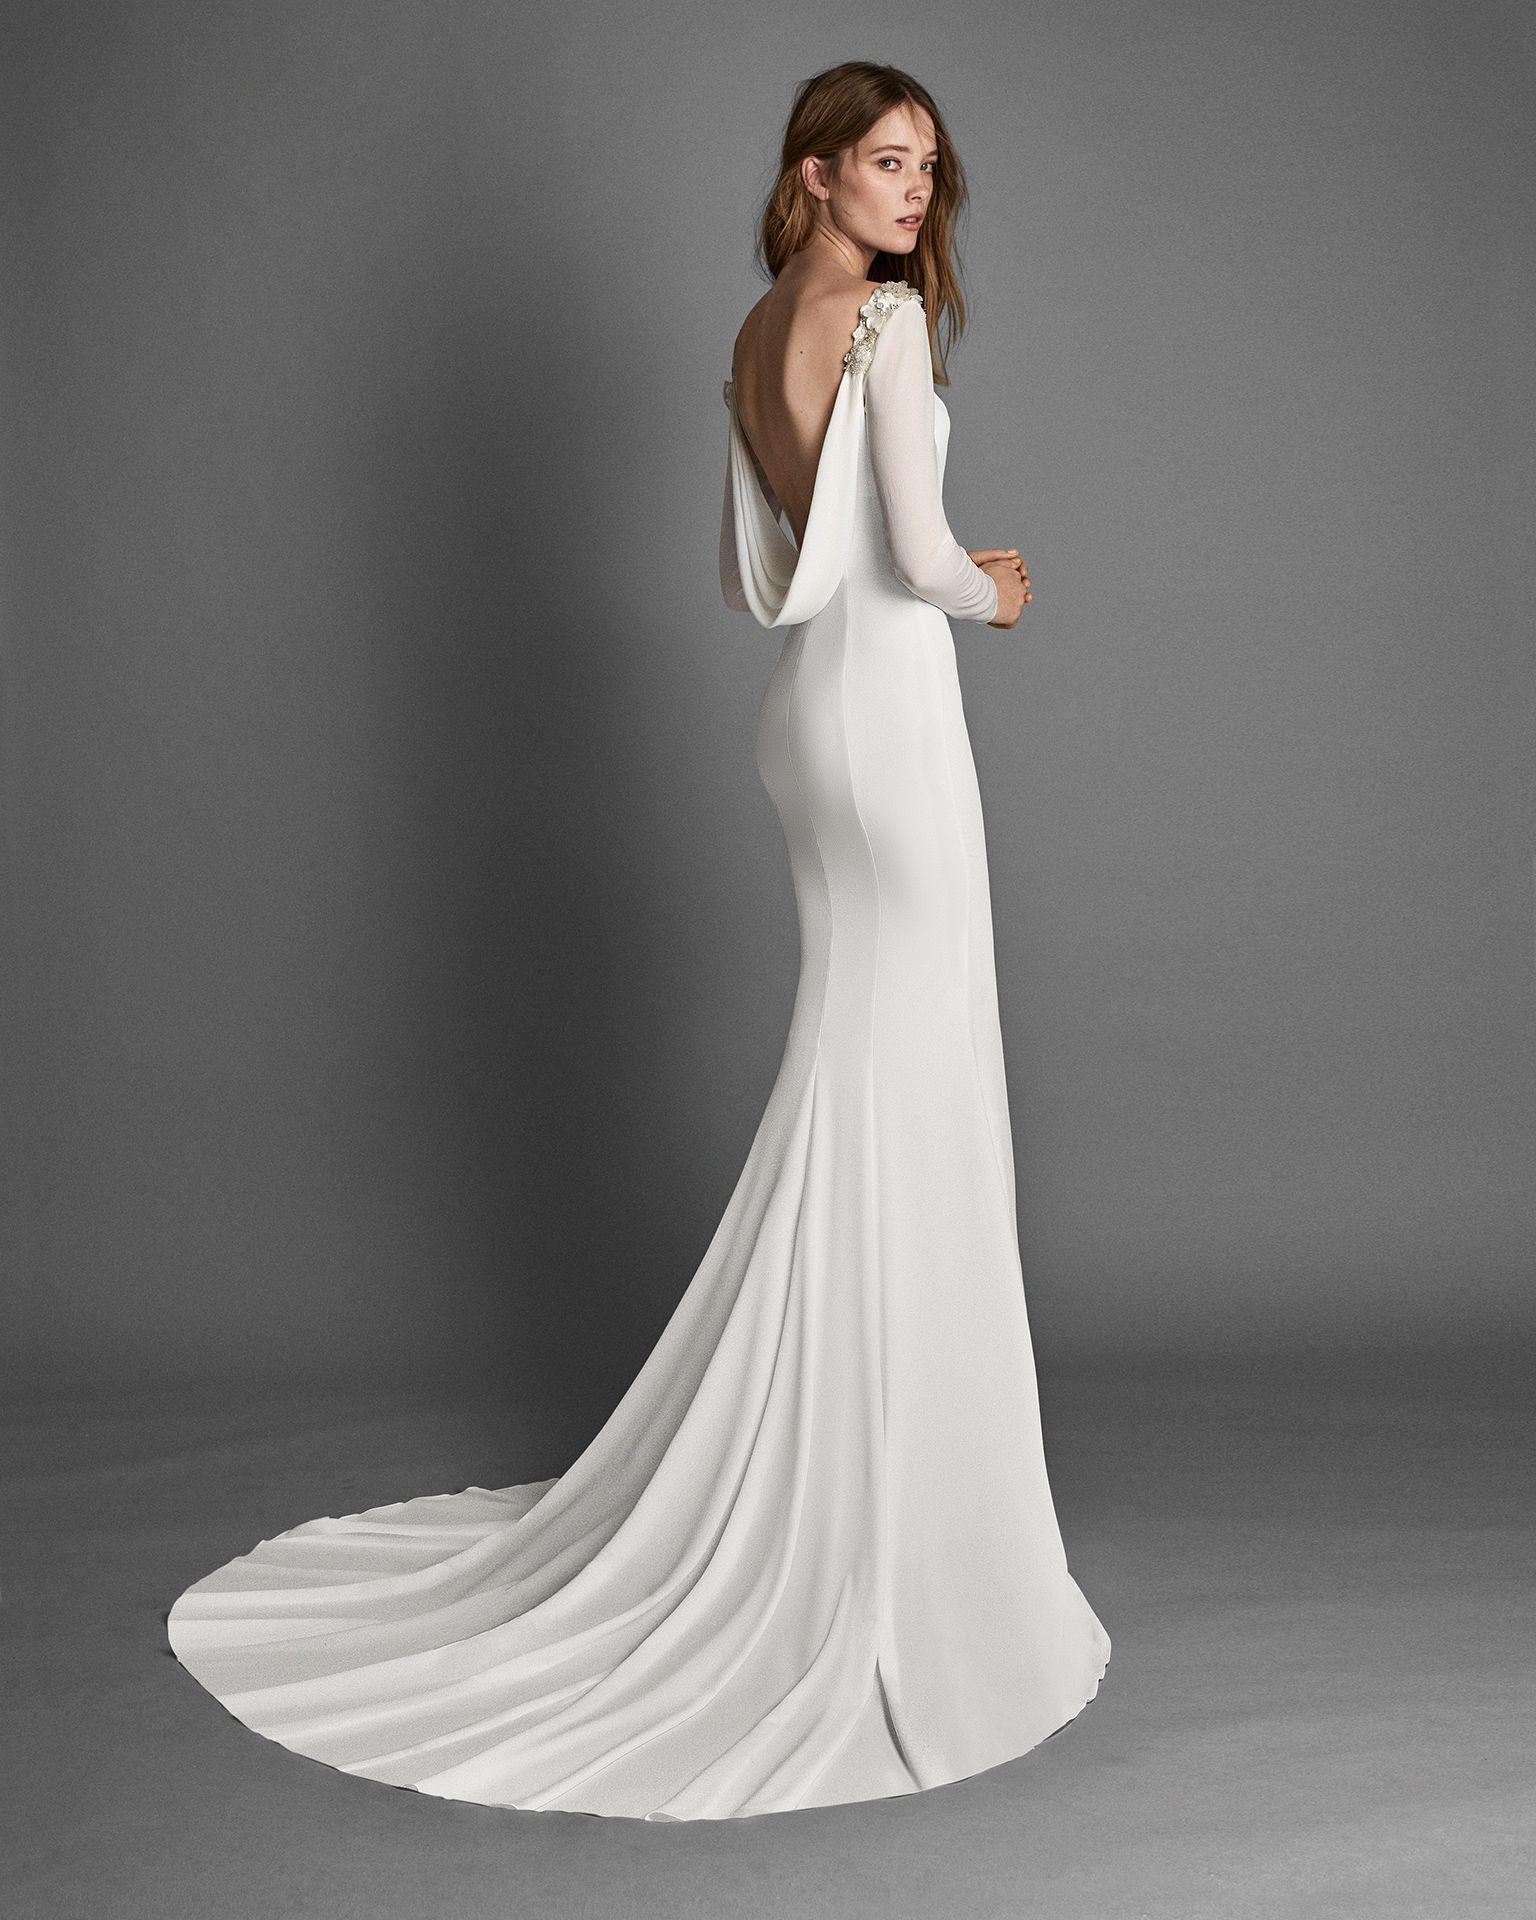 Randa Bridal 2018 Alma Novia Collection Minimal Wedding Dress Wedding Dress Long Sleeve Stunning Wedding Dresses [ 1920 x 1536 Pixel ]